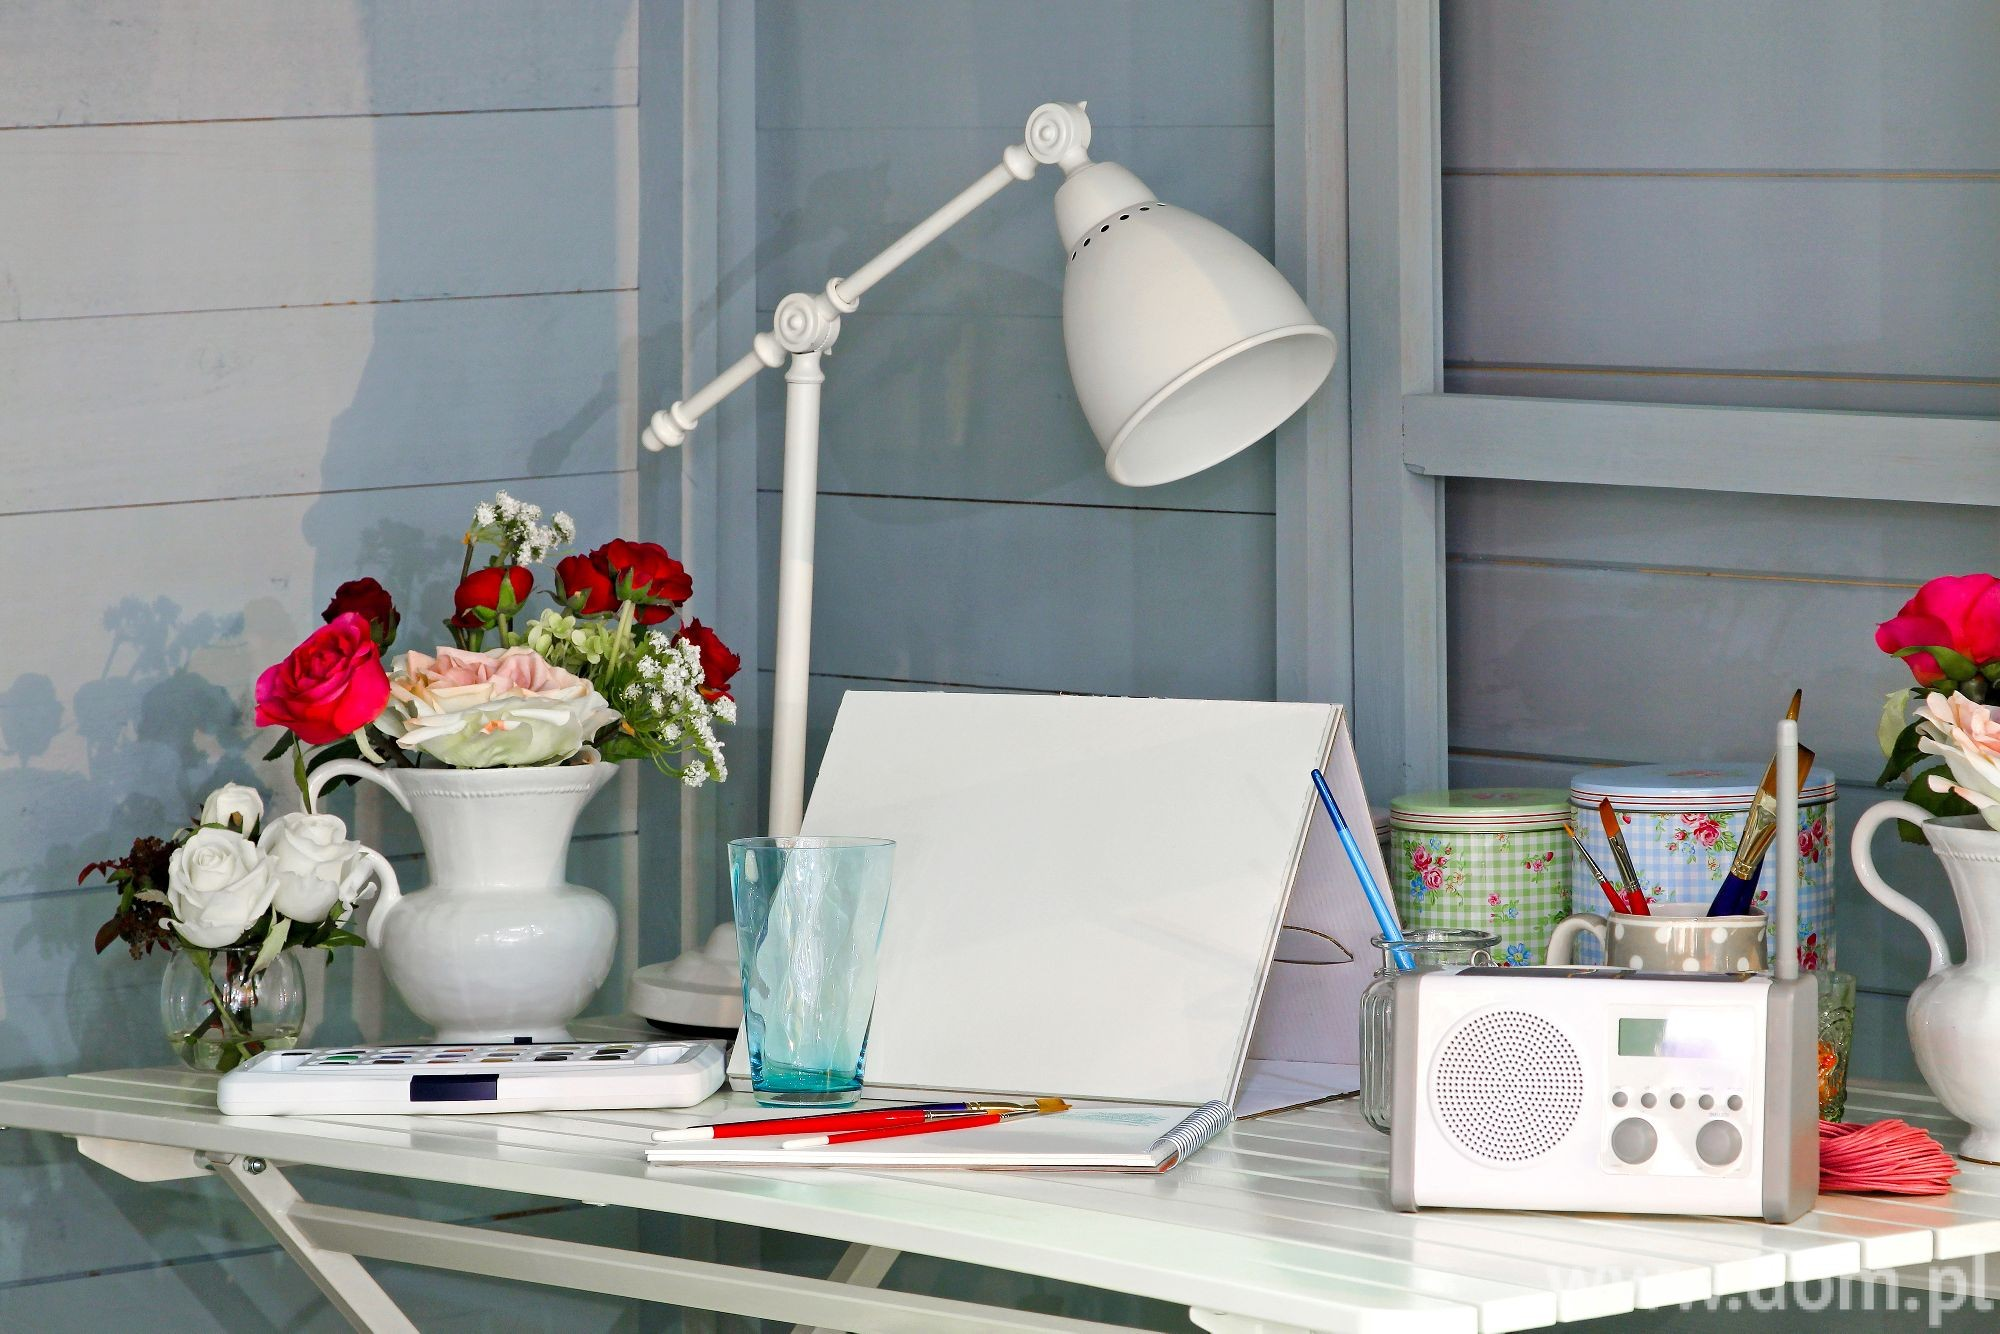 Lampka biurowa, notatnik i akcesoria biurowe